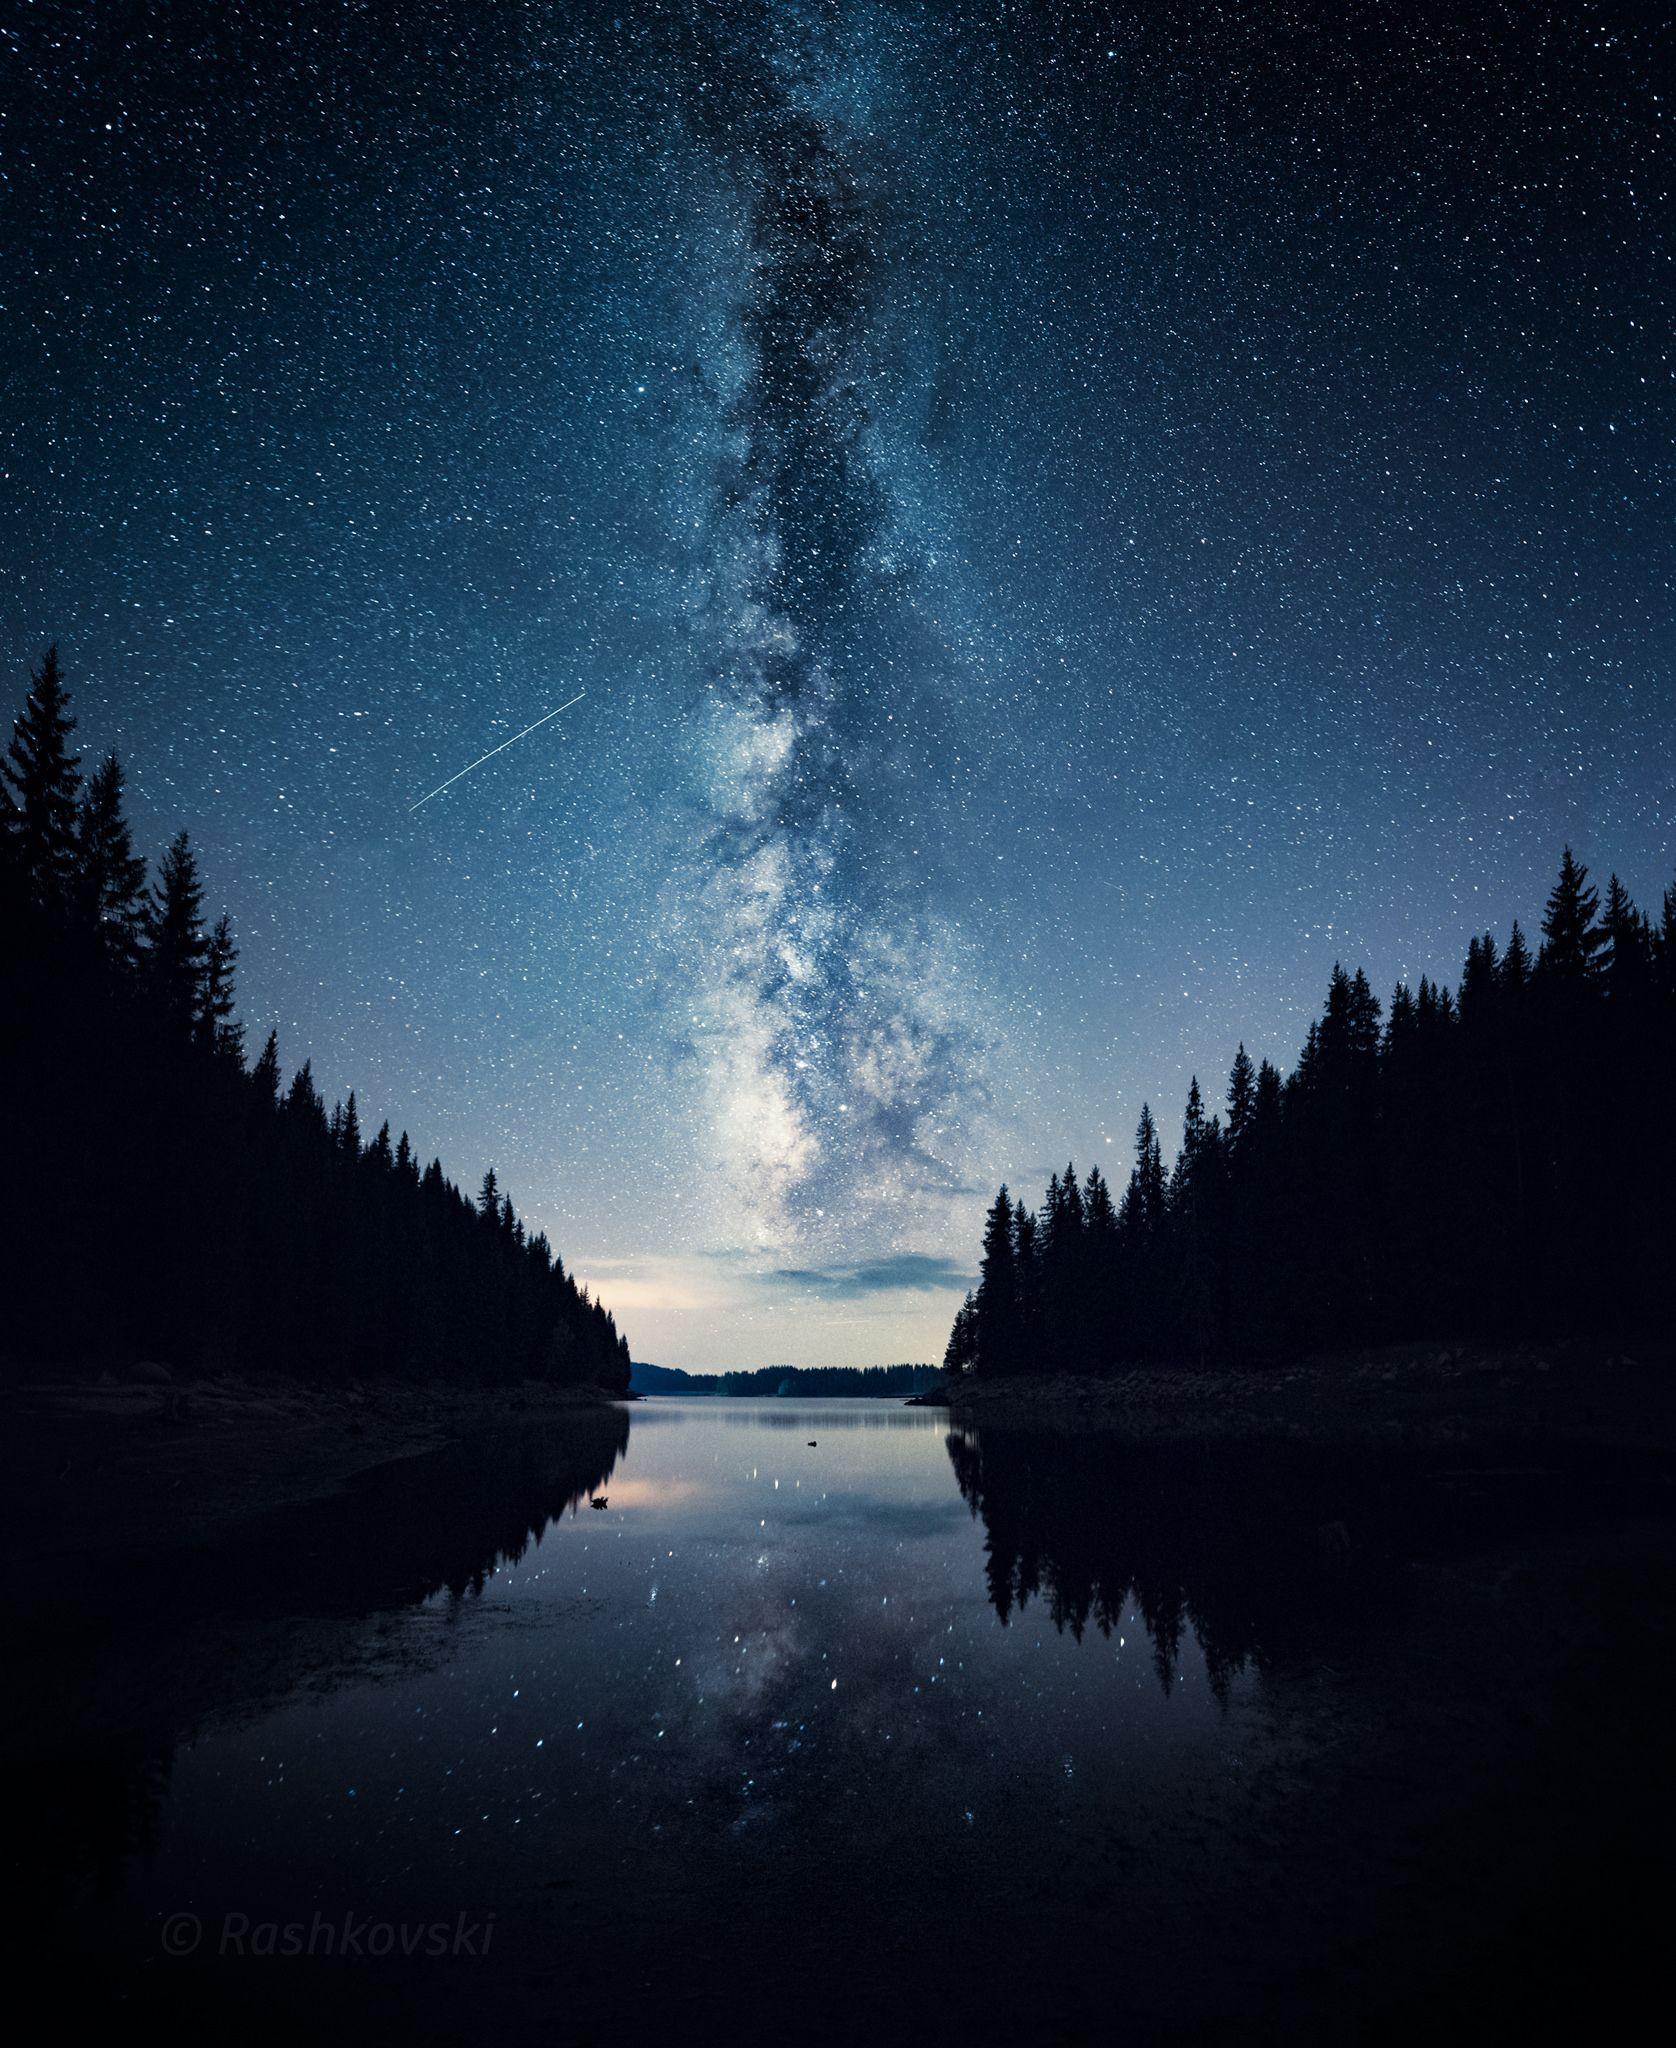 Milky Way And A Falling Star Over Shiroka Polyana Reservoir Rhodope Mountains Bulgaria Faceboo Night Sky Photography Night Sky Wallpaper Sky Photography